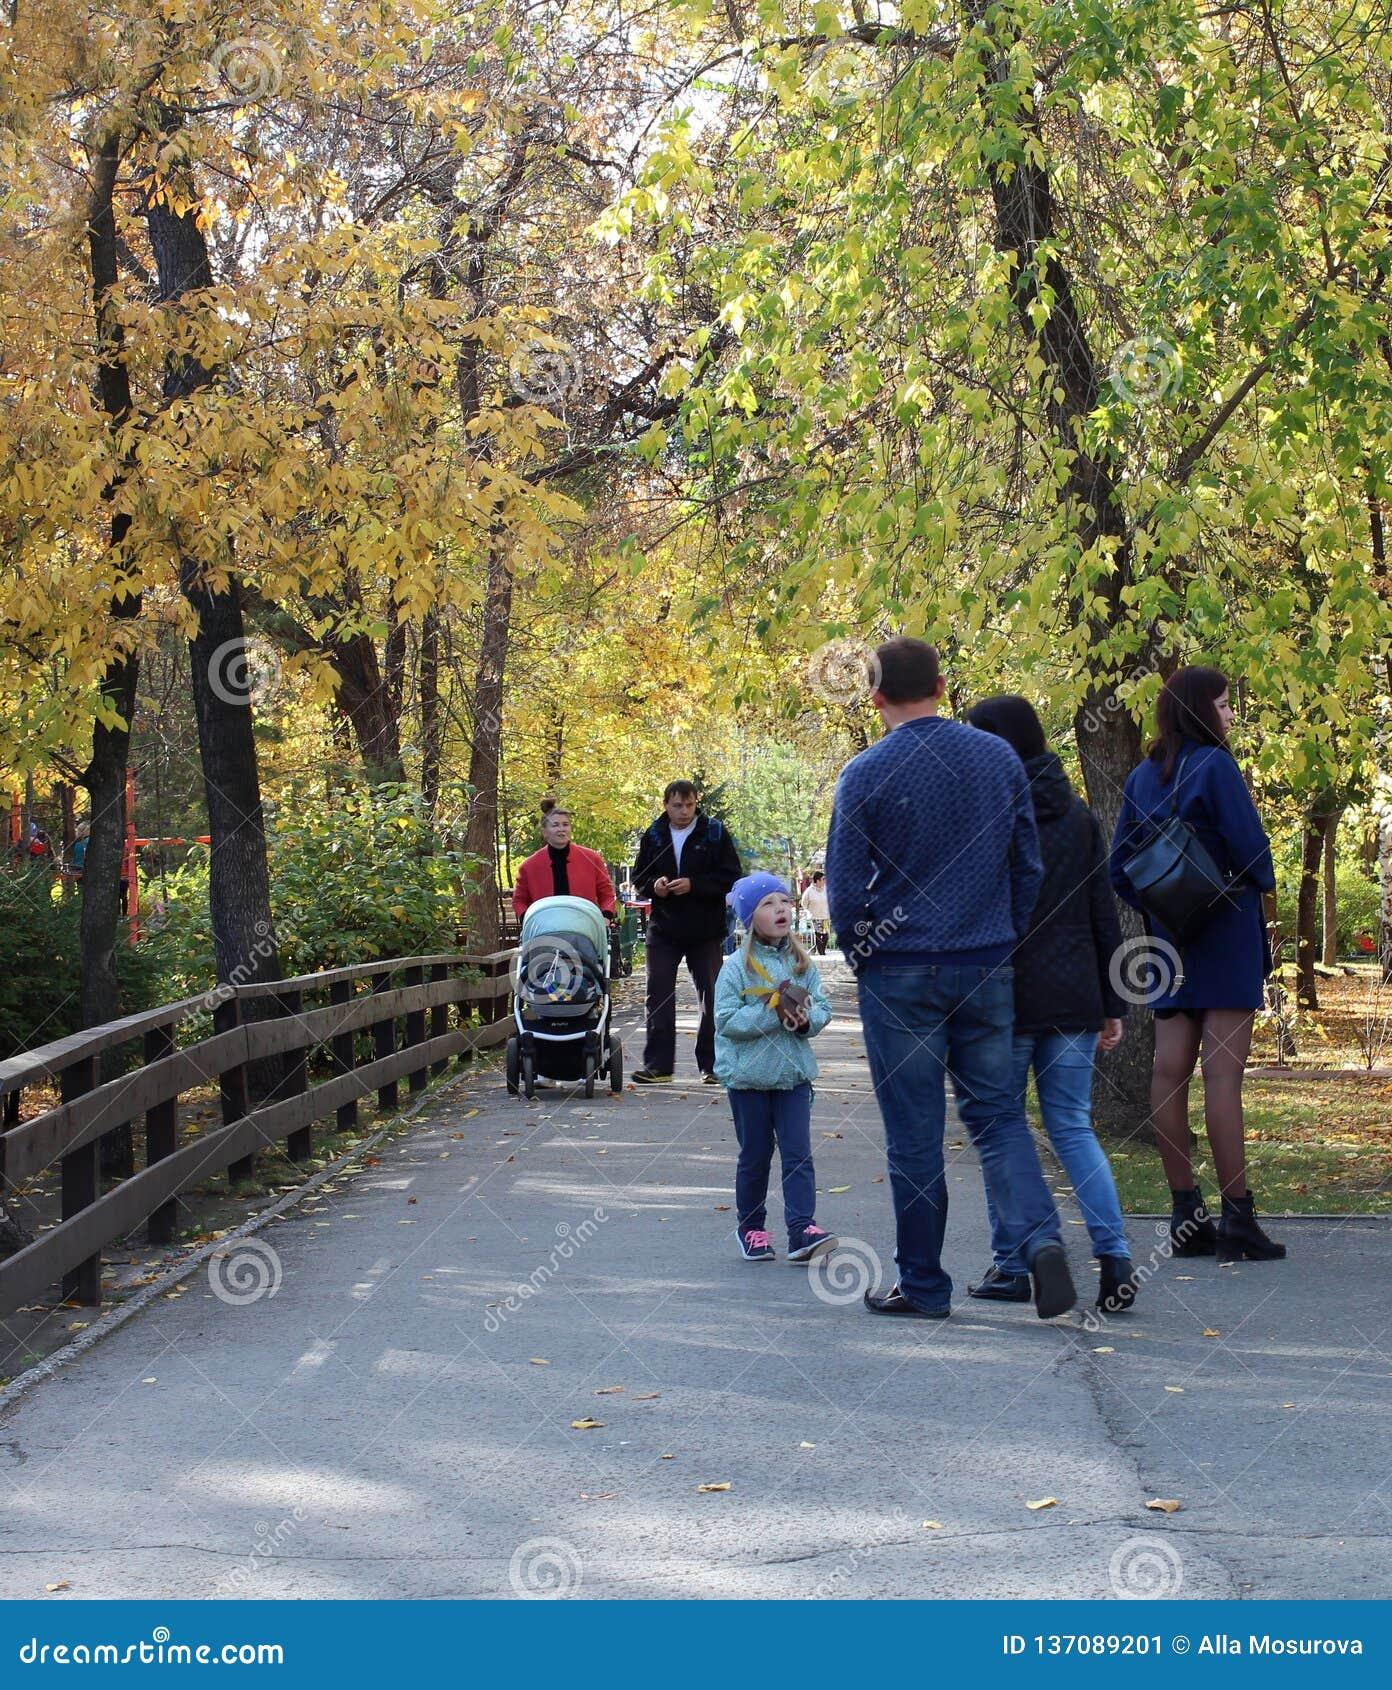 Men women and children walk in a beautiful Park in autumn Kirov Park Novosibirsk summer 2018